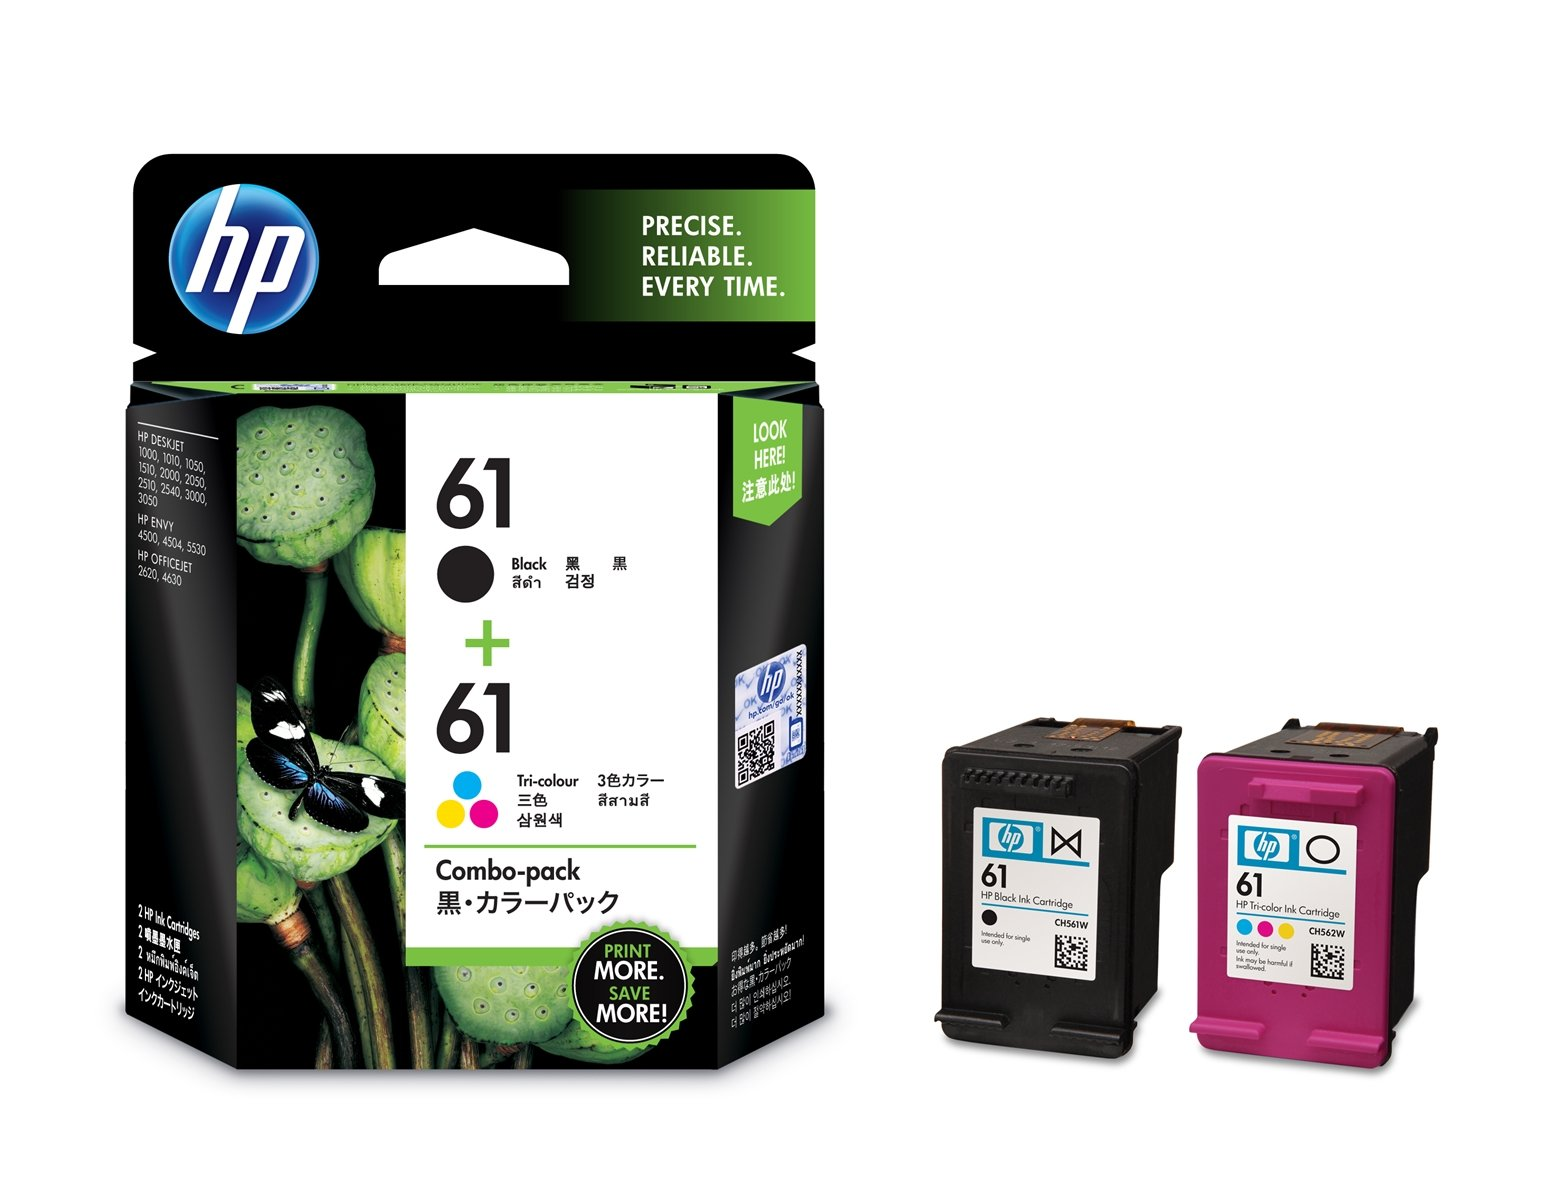 HP 61 Ink Cartridges, Black / Tri-color, 2-Pack (CR311) Retail Packing